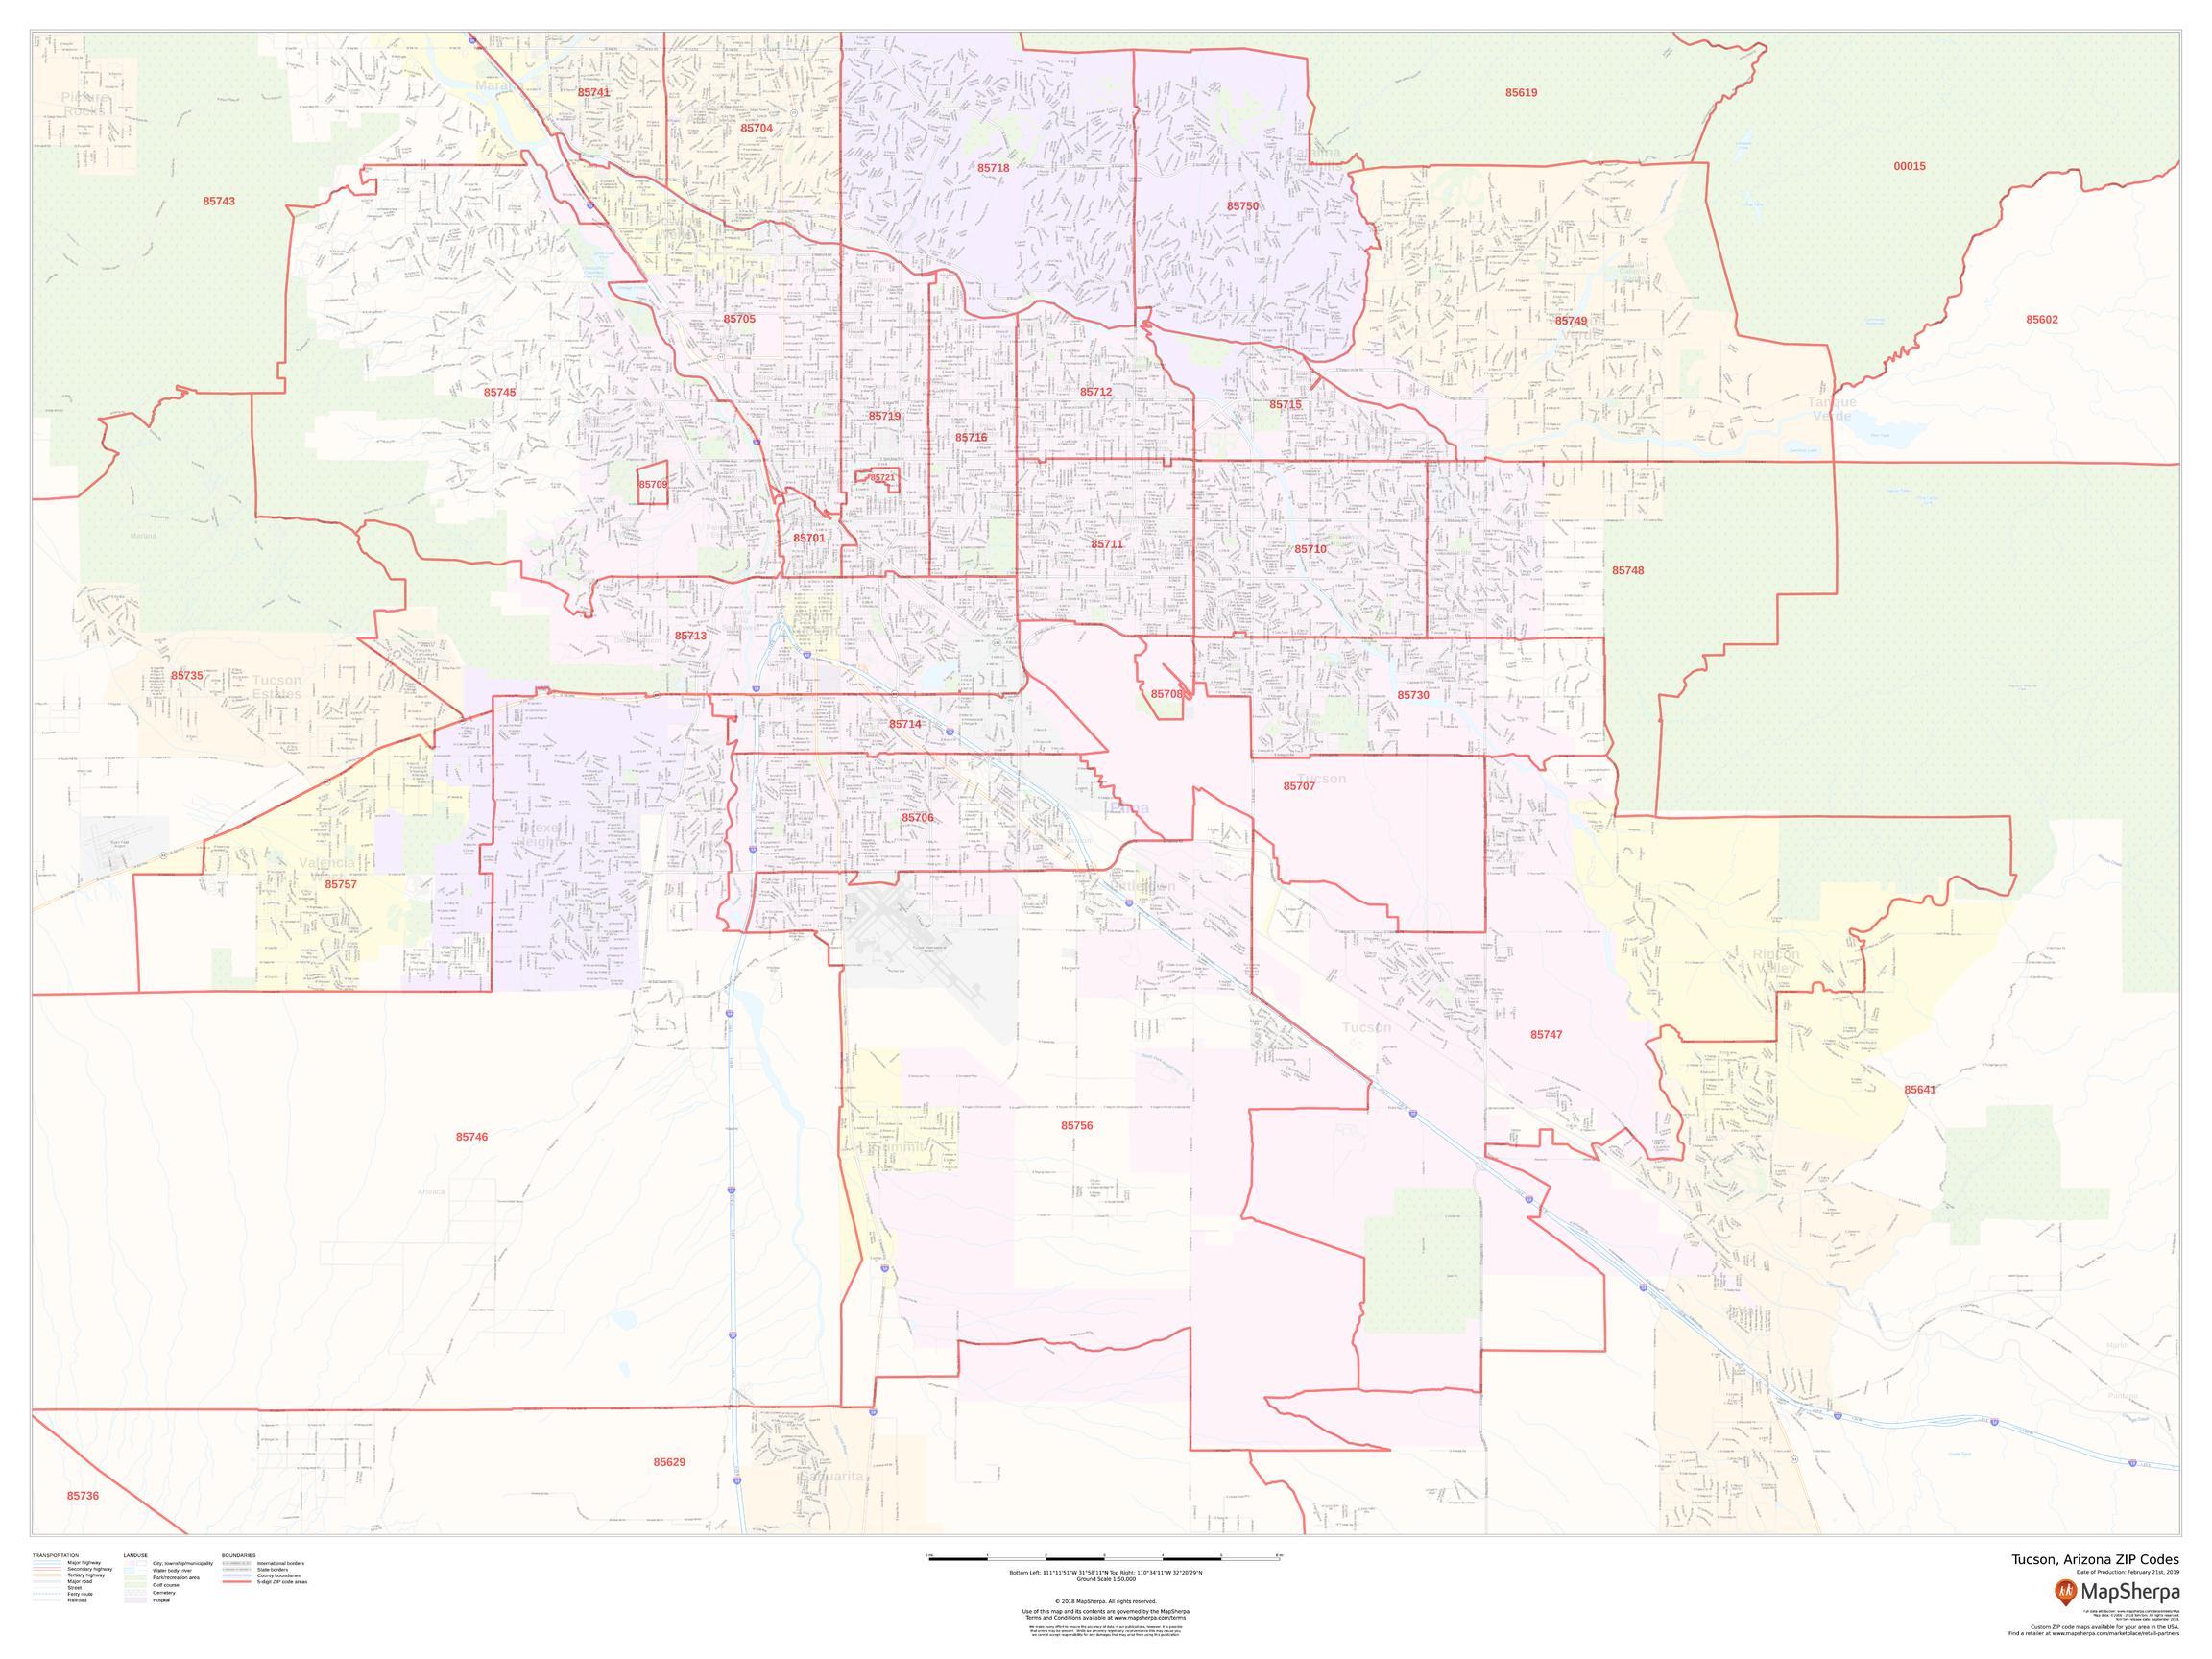 Tucson AZ Zip Code Map on arizona tucson, zip code map tucson, weather tucson, street map tucson,